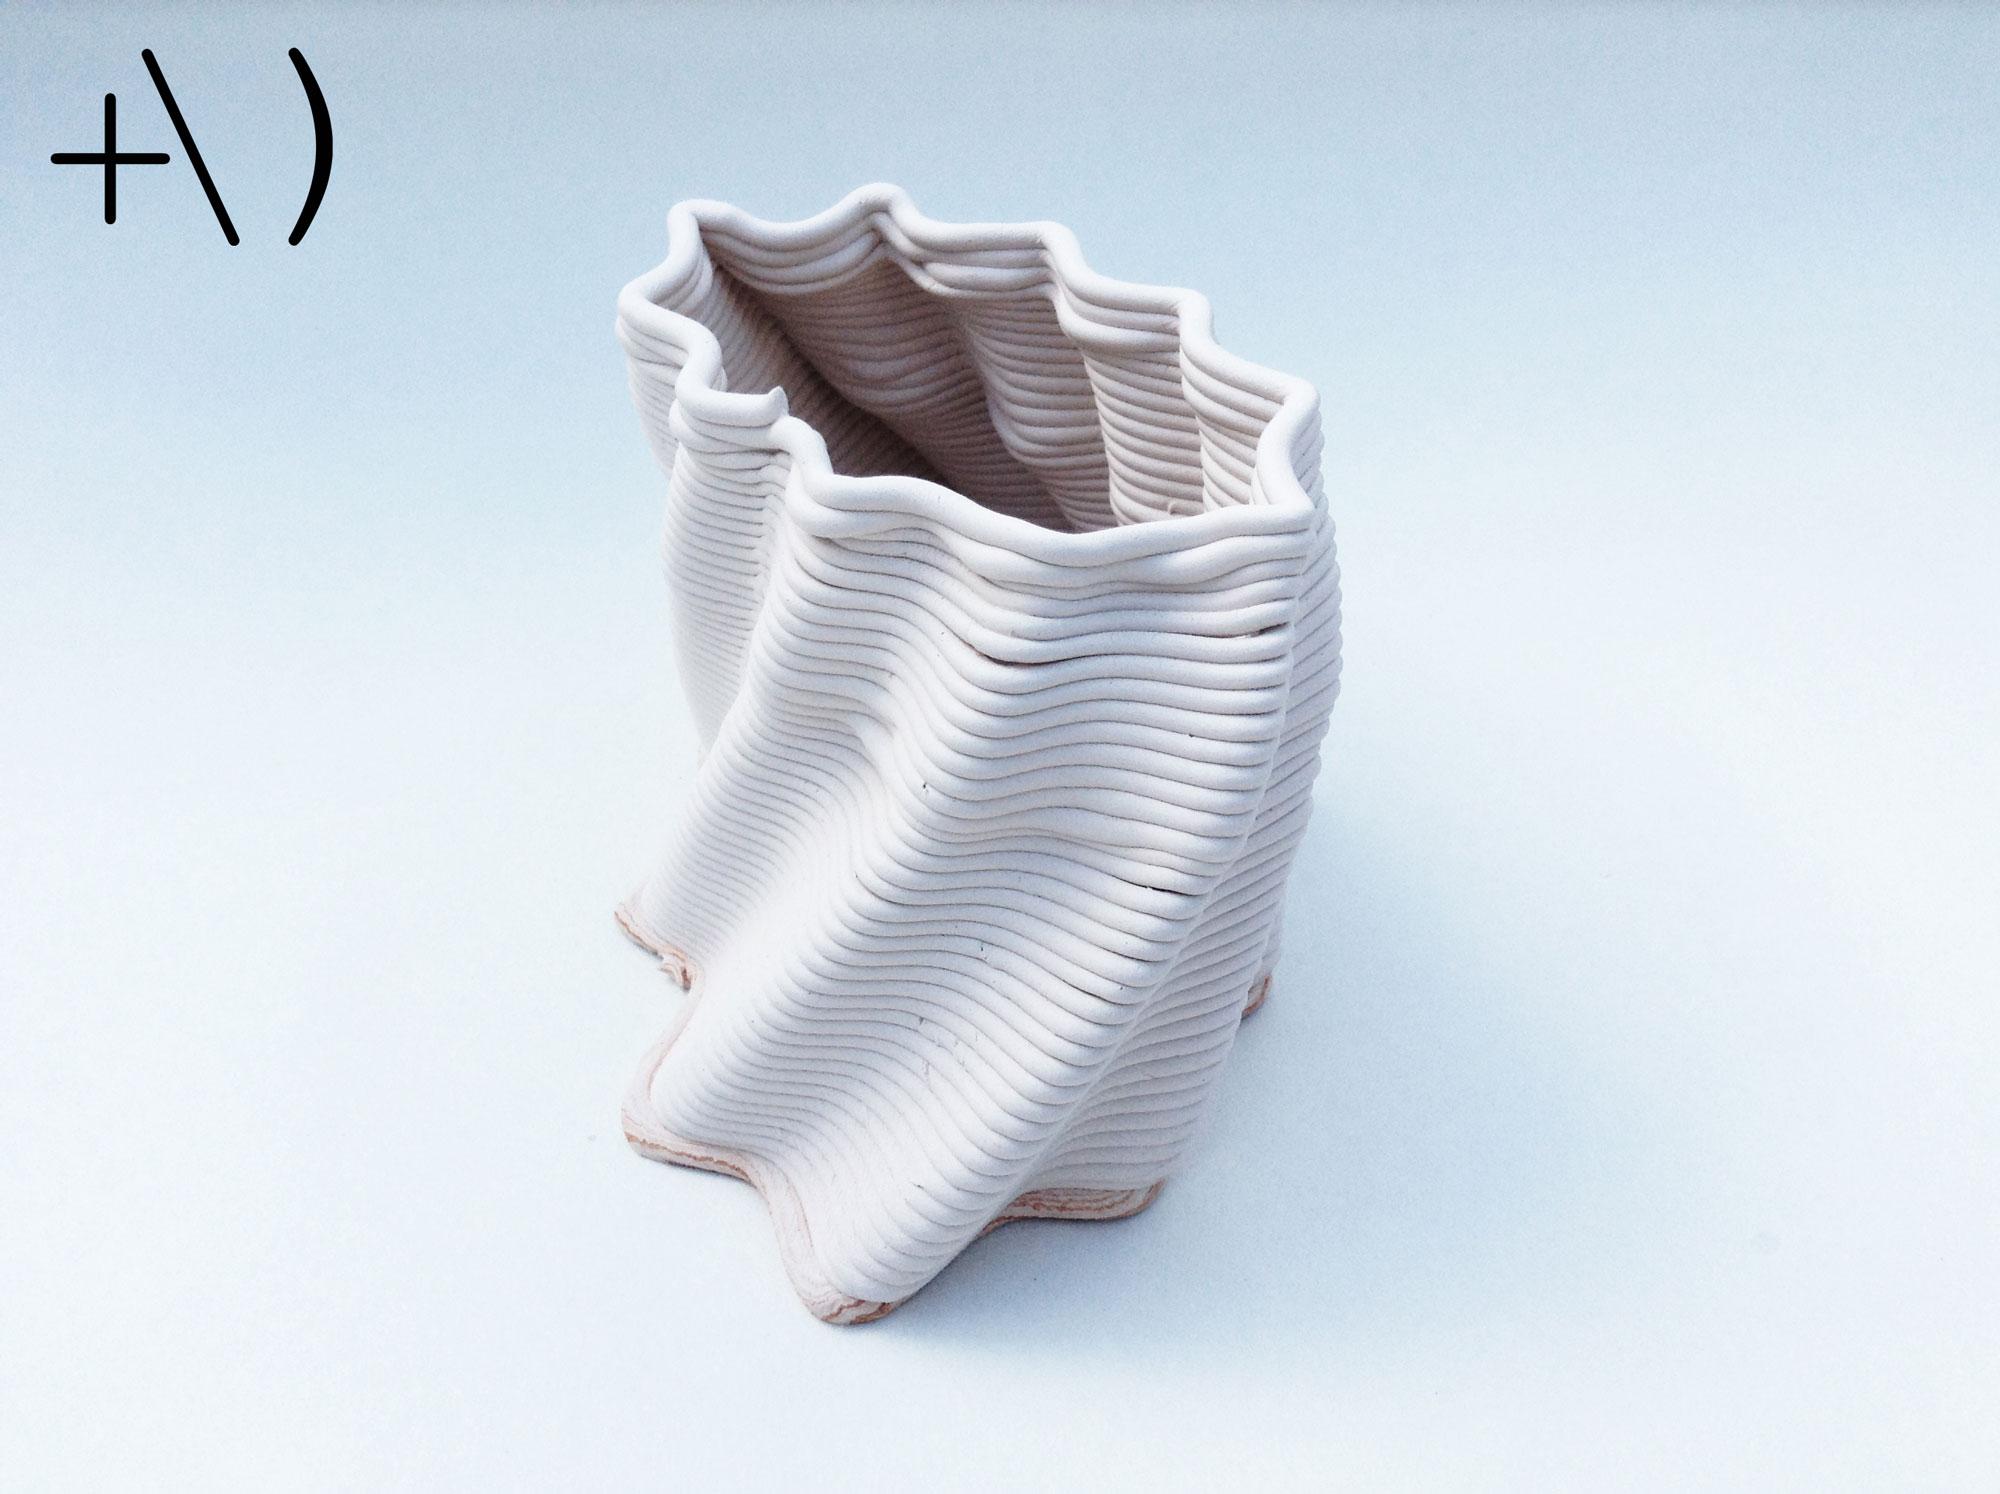 computational clay design torsione laterale